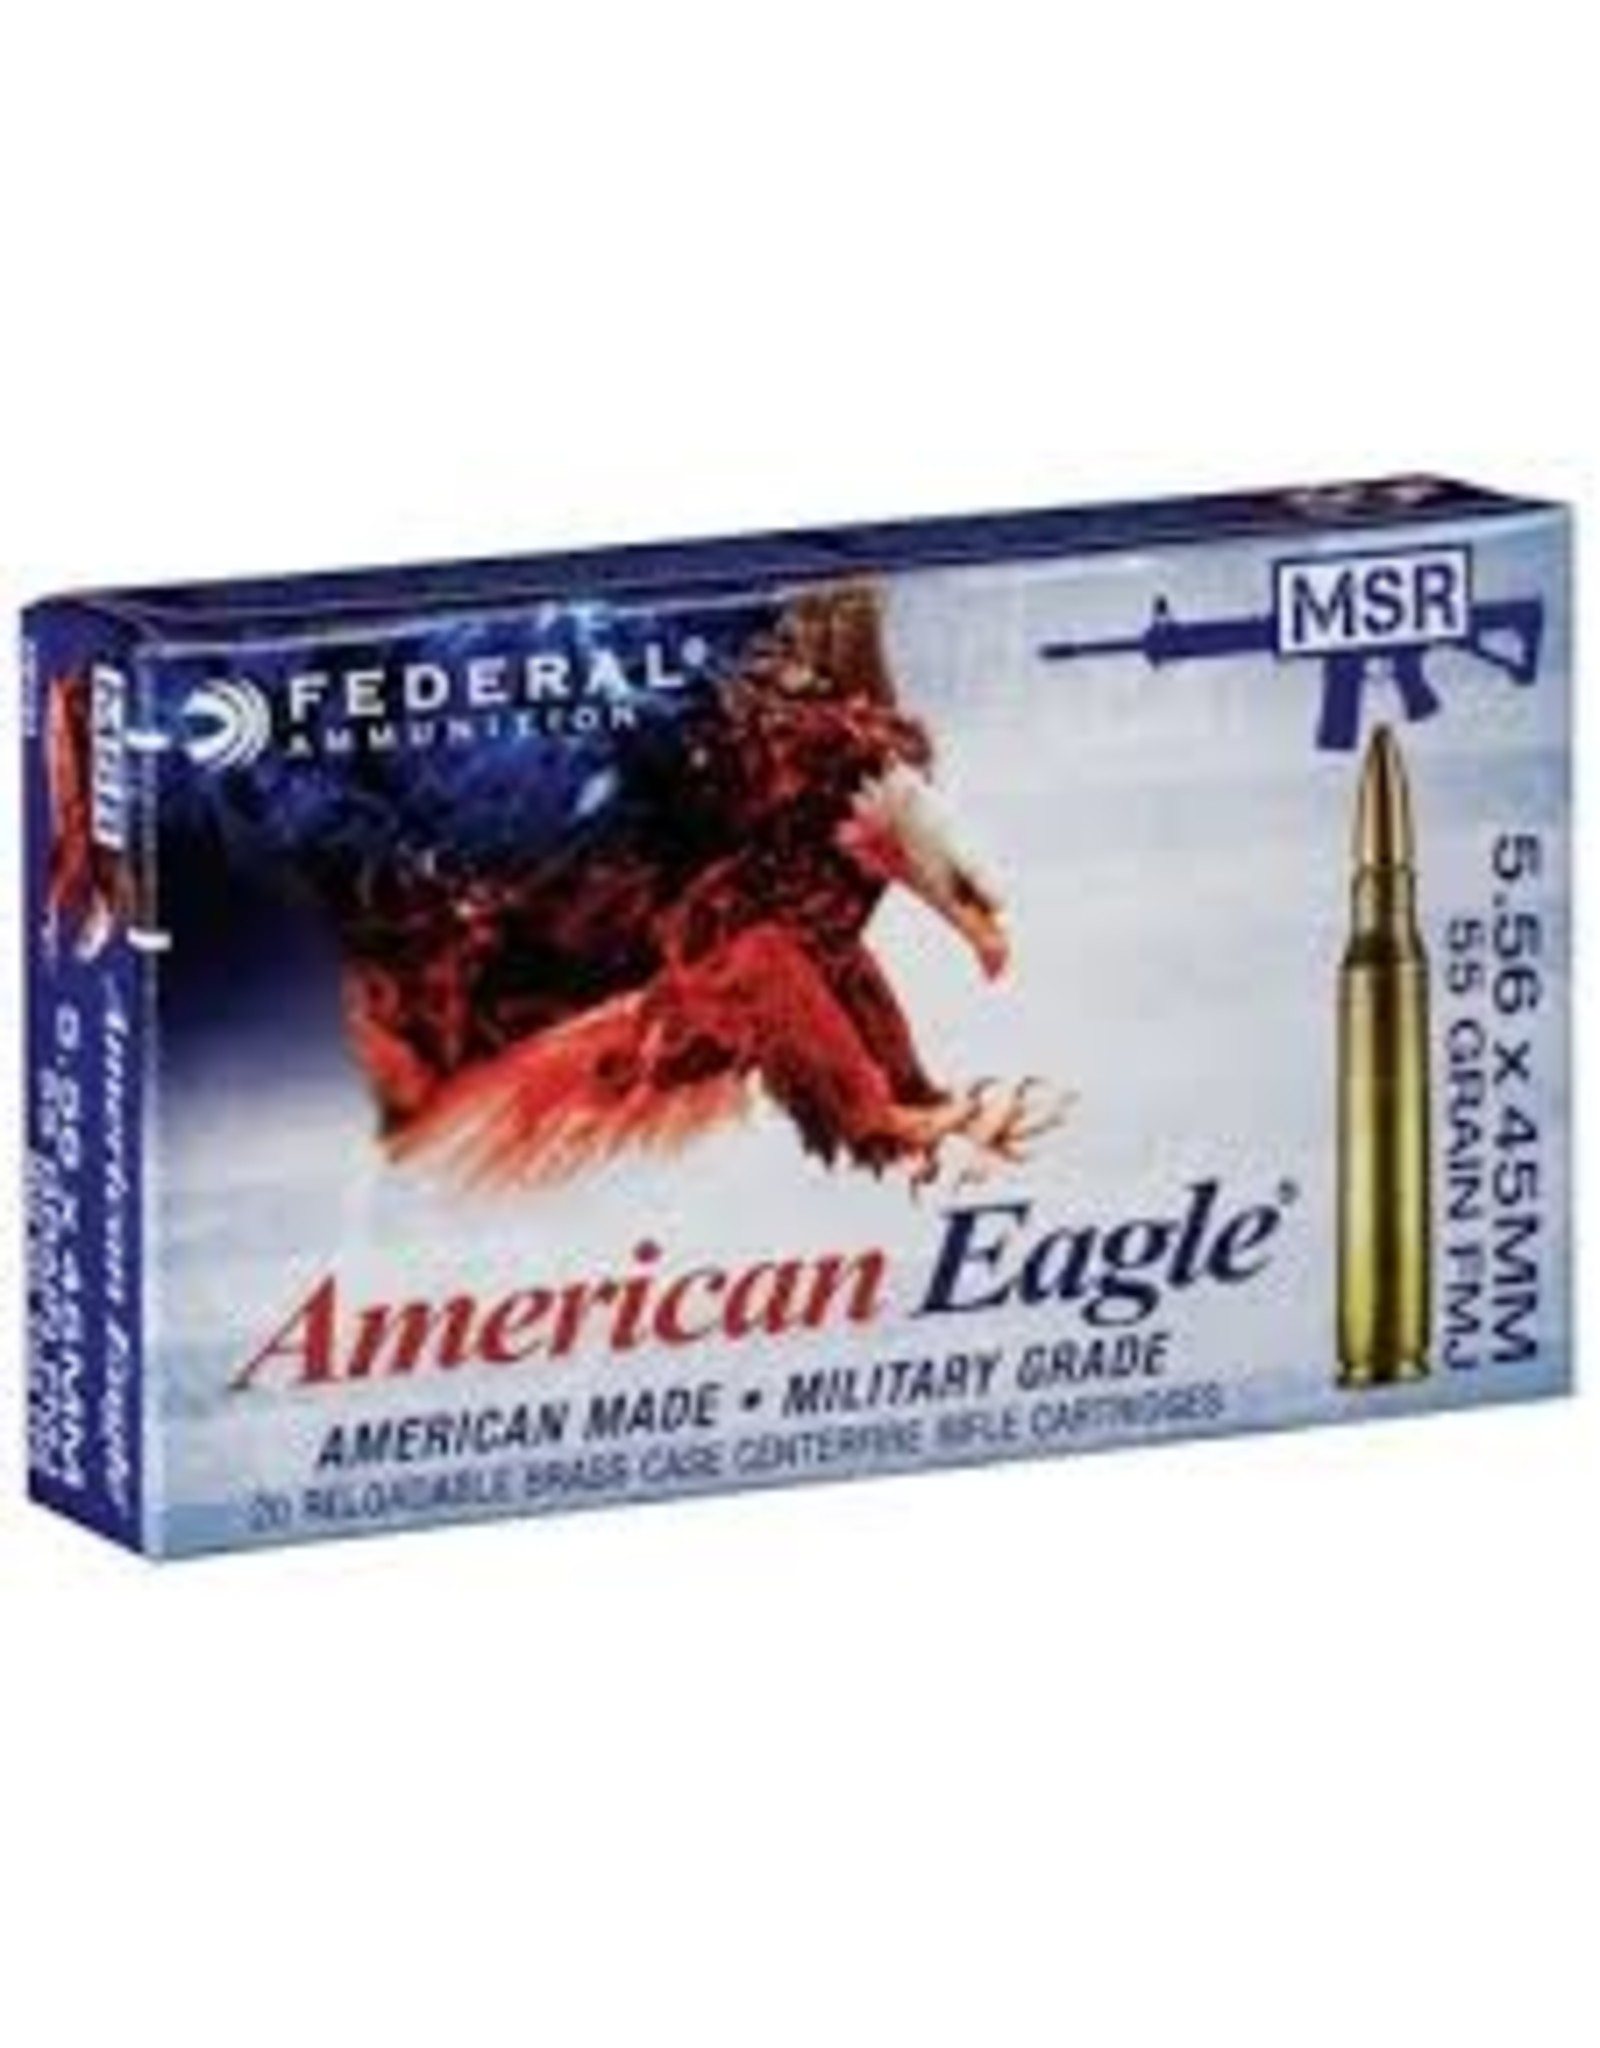 American Eagle American Eagle 5.56 55gr 20rds